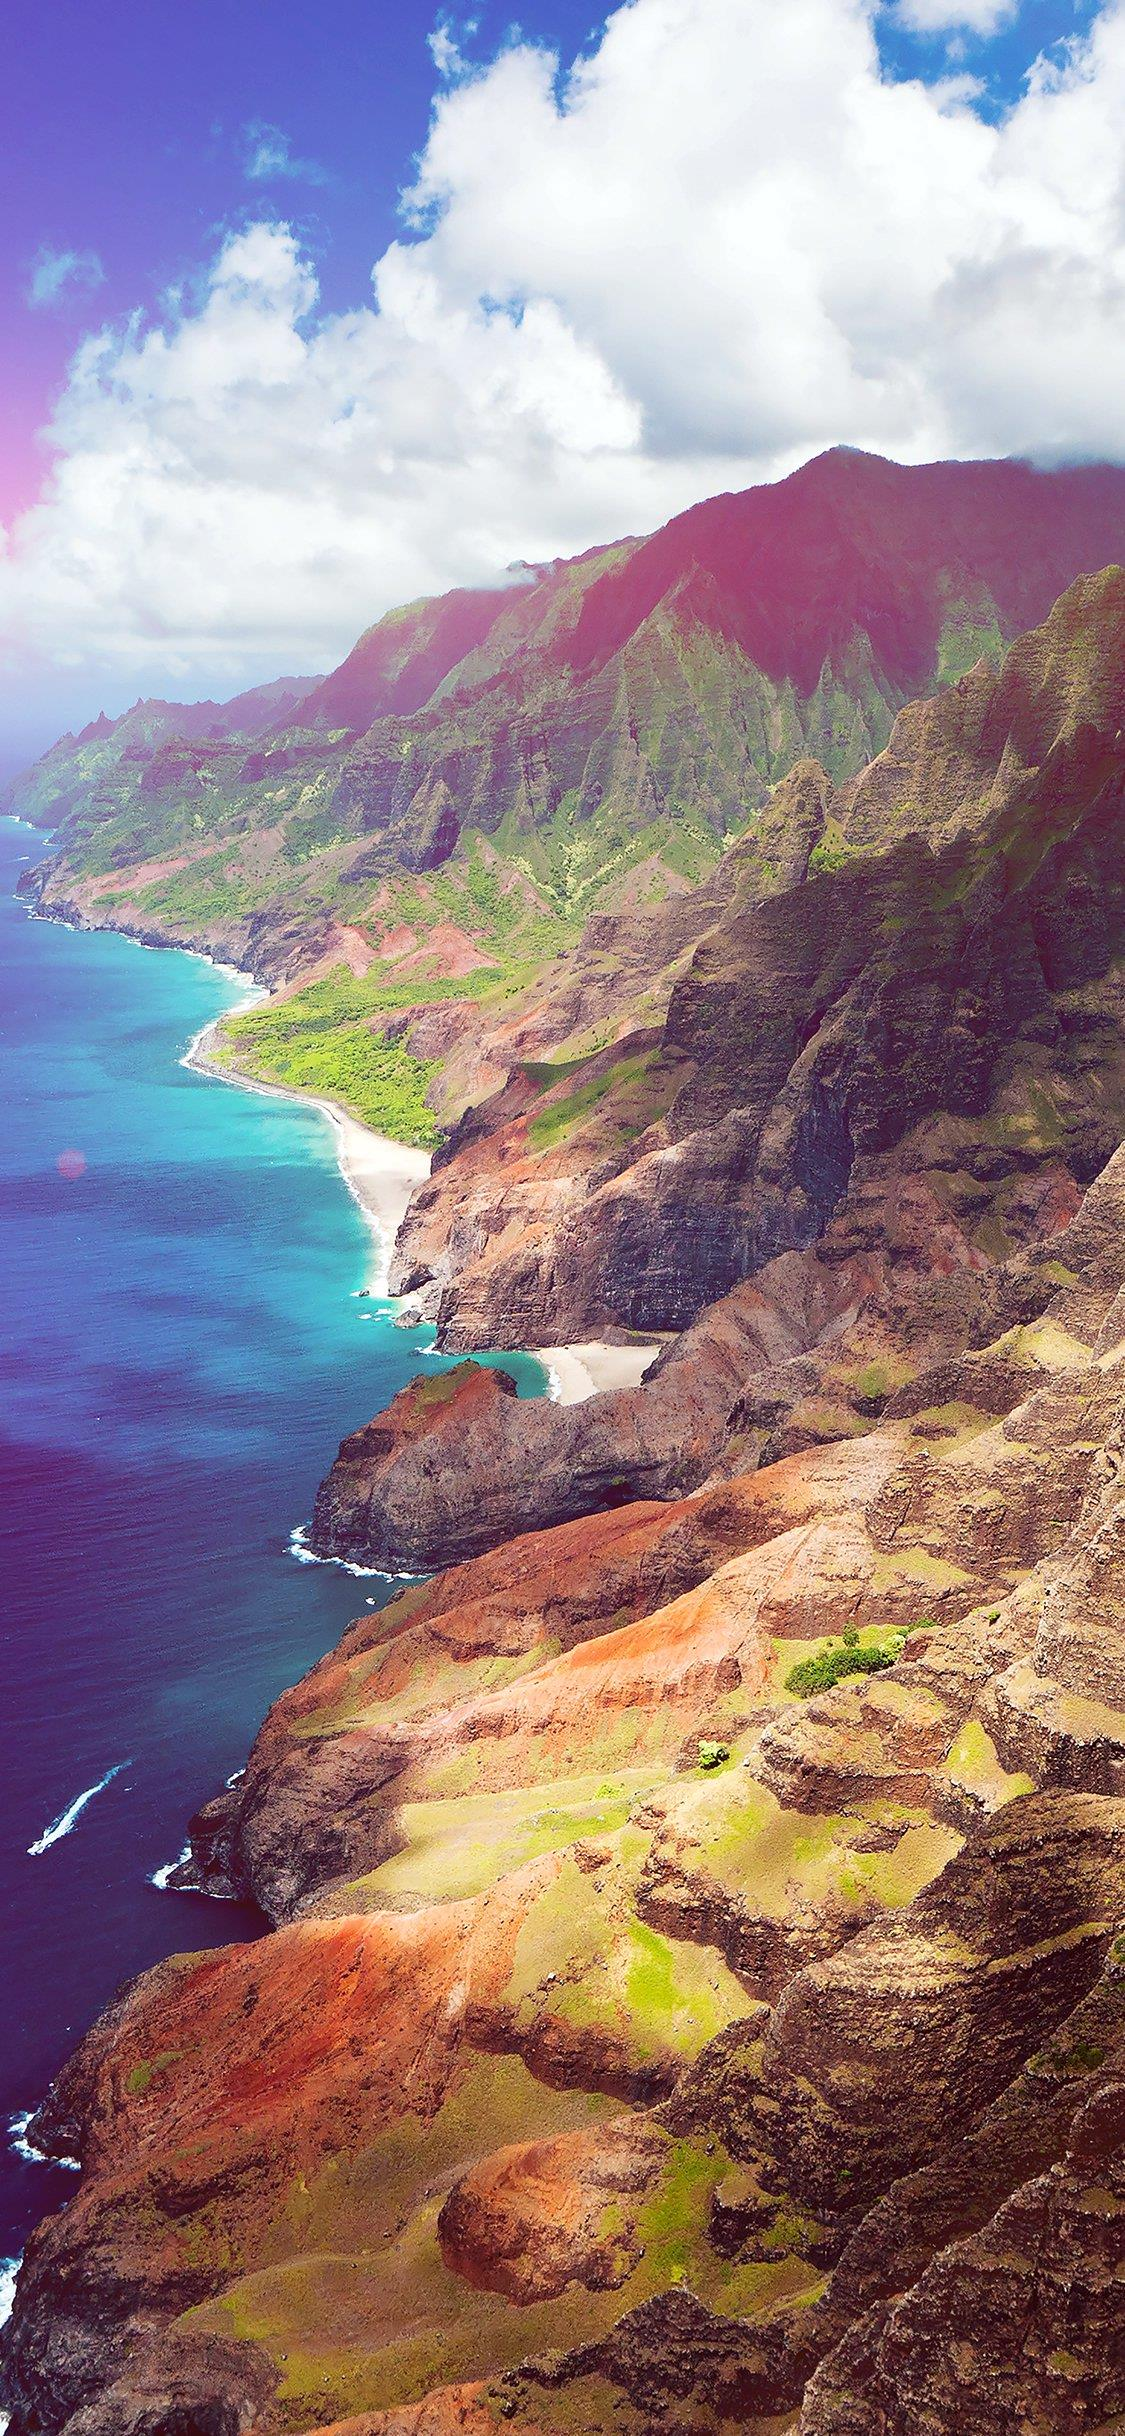 Una foto aerea di una costiera - Sfondi per iPhone, i migliori da scaricare gratis